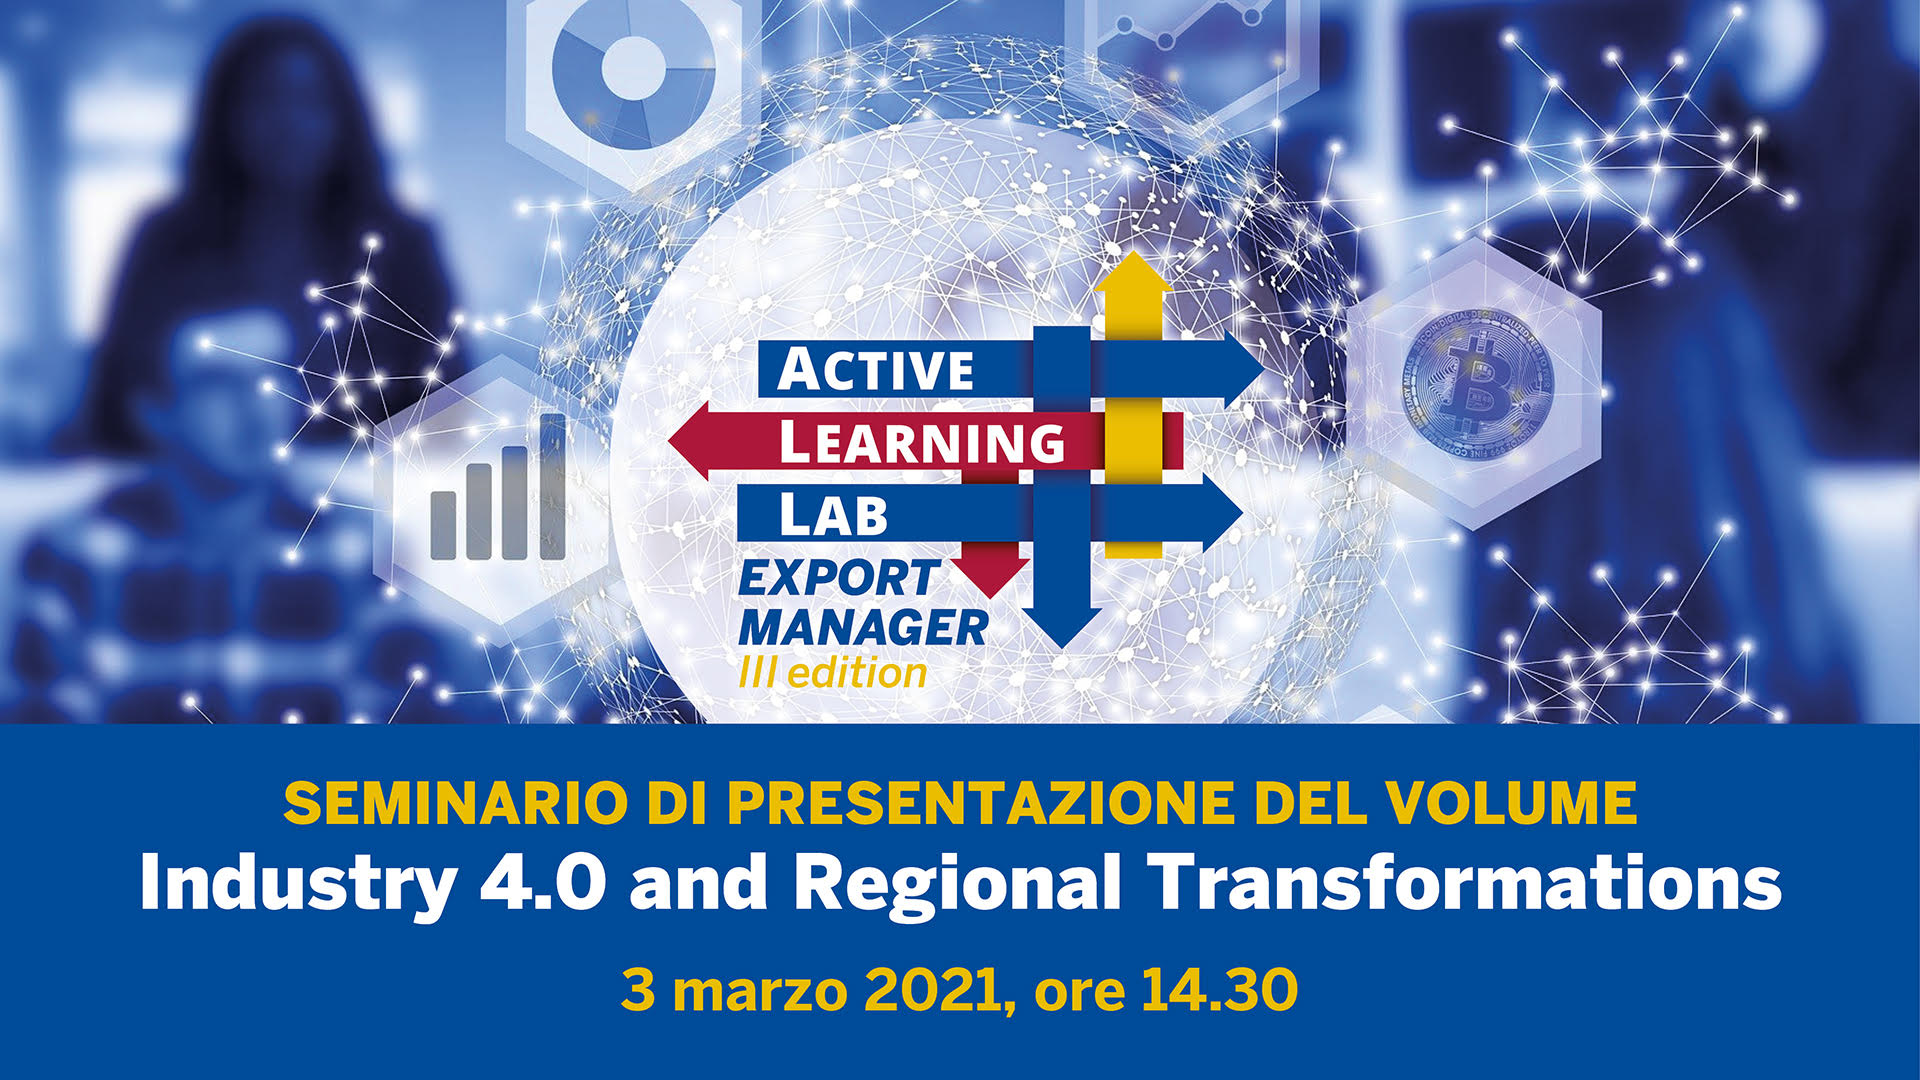 Immagine Seminario 3 marzo 2021: Industry 4.0 and Regional Transformations